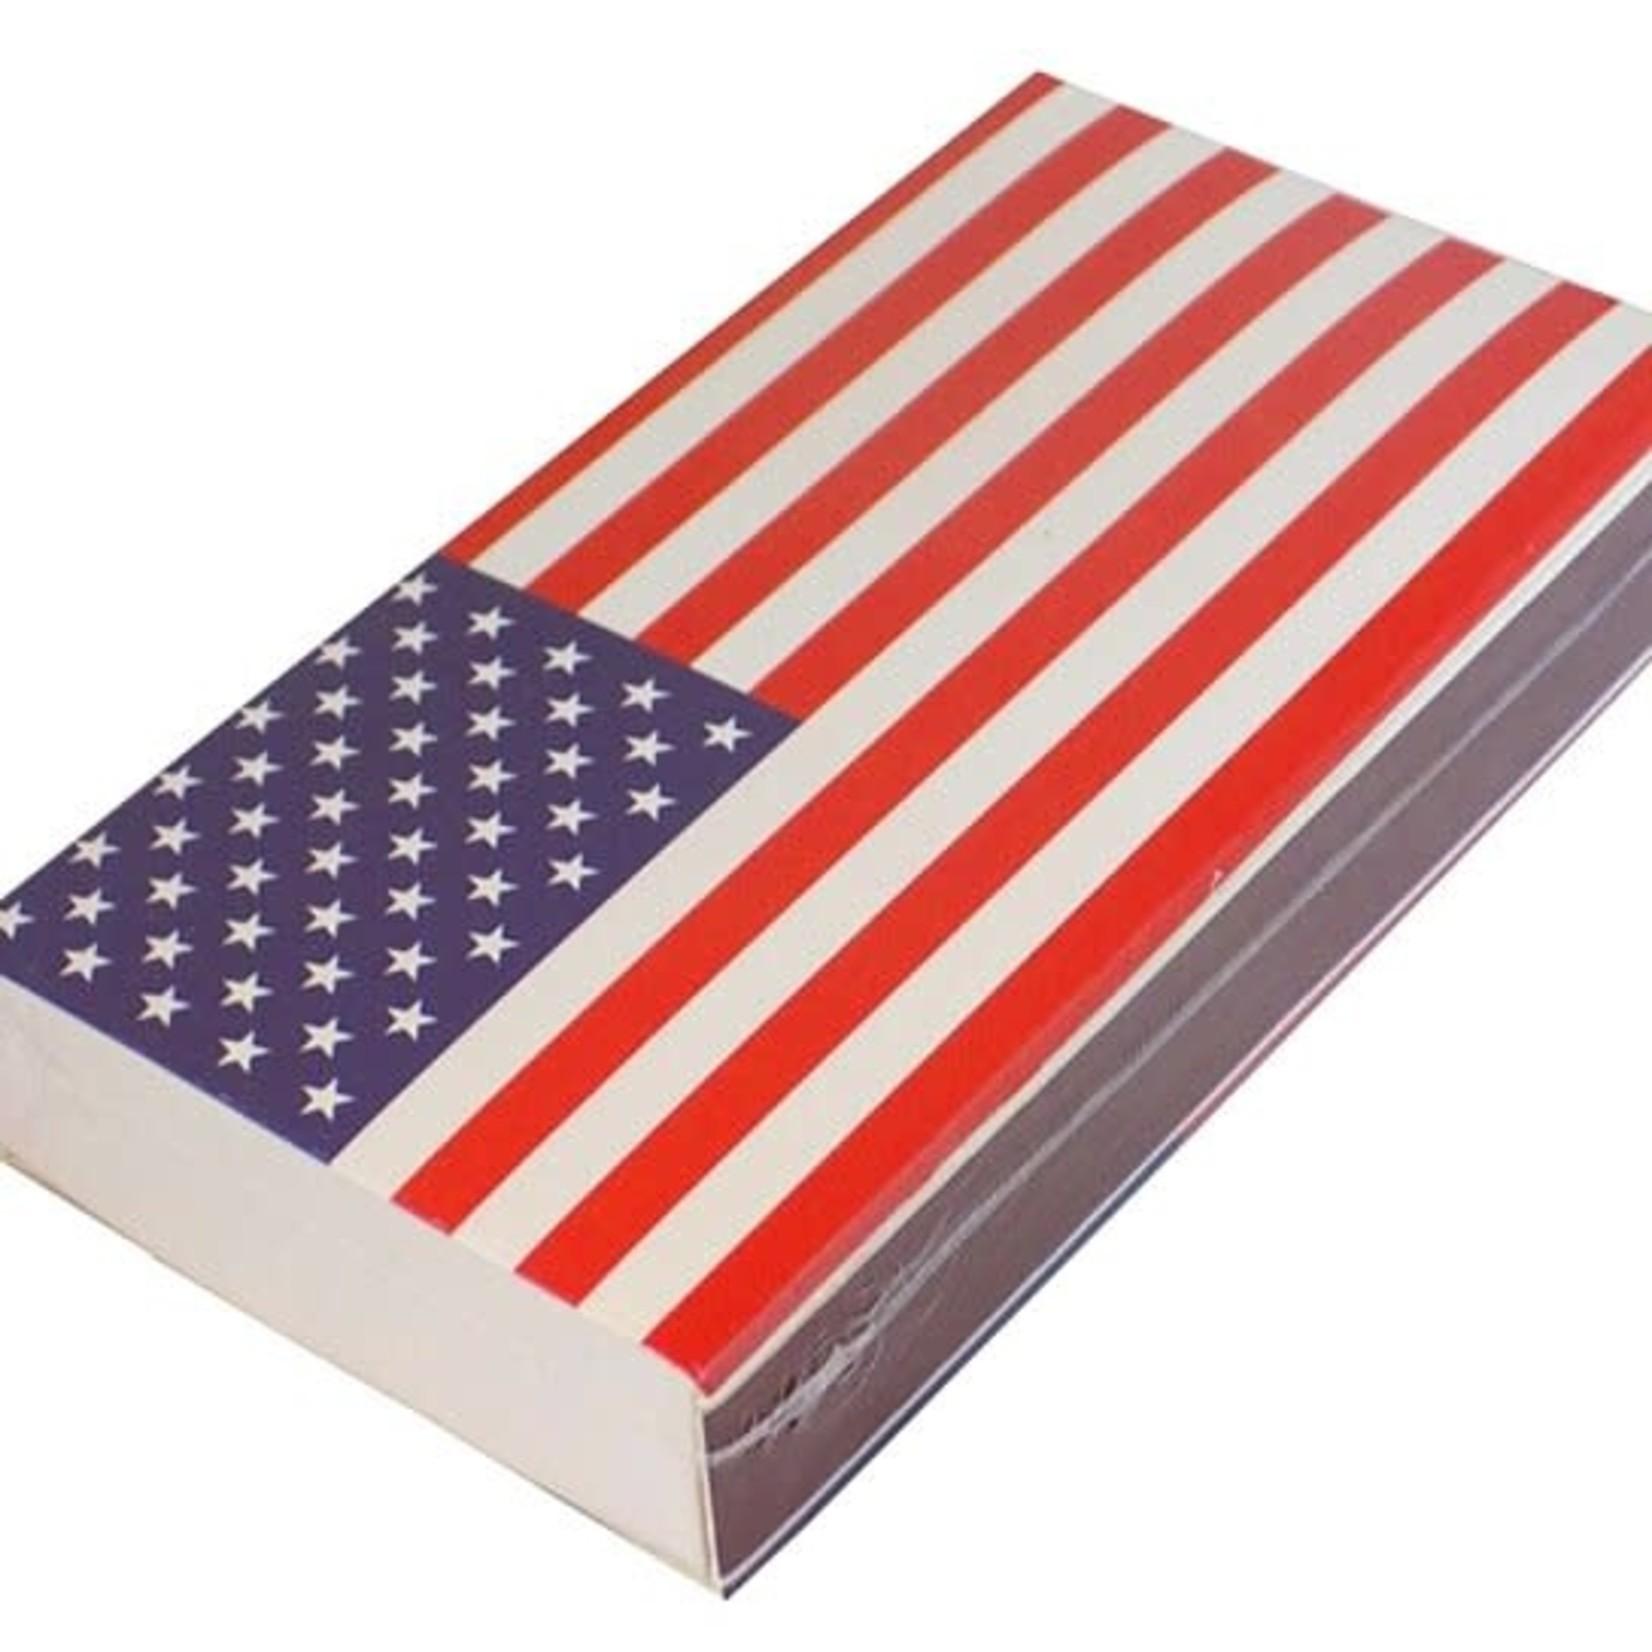 The Joy of Light Joy of Light Matchbook American Flag